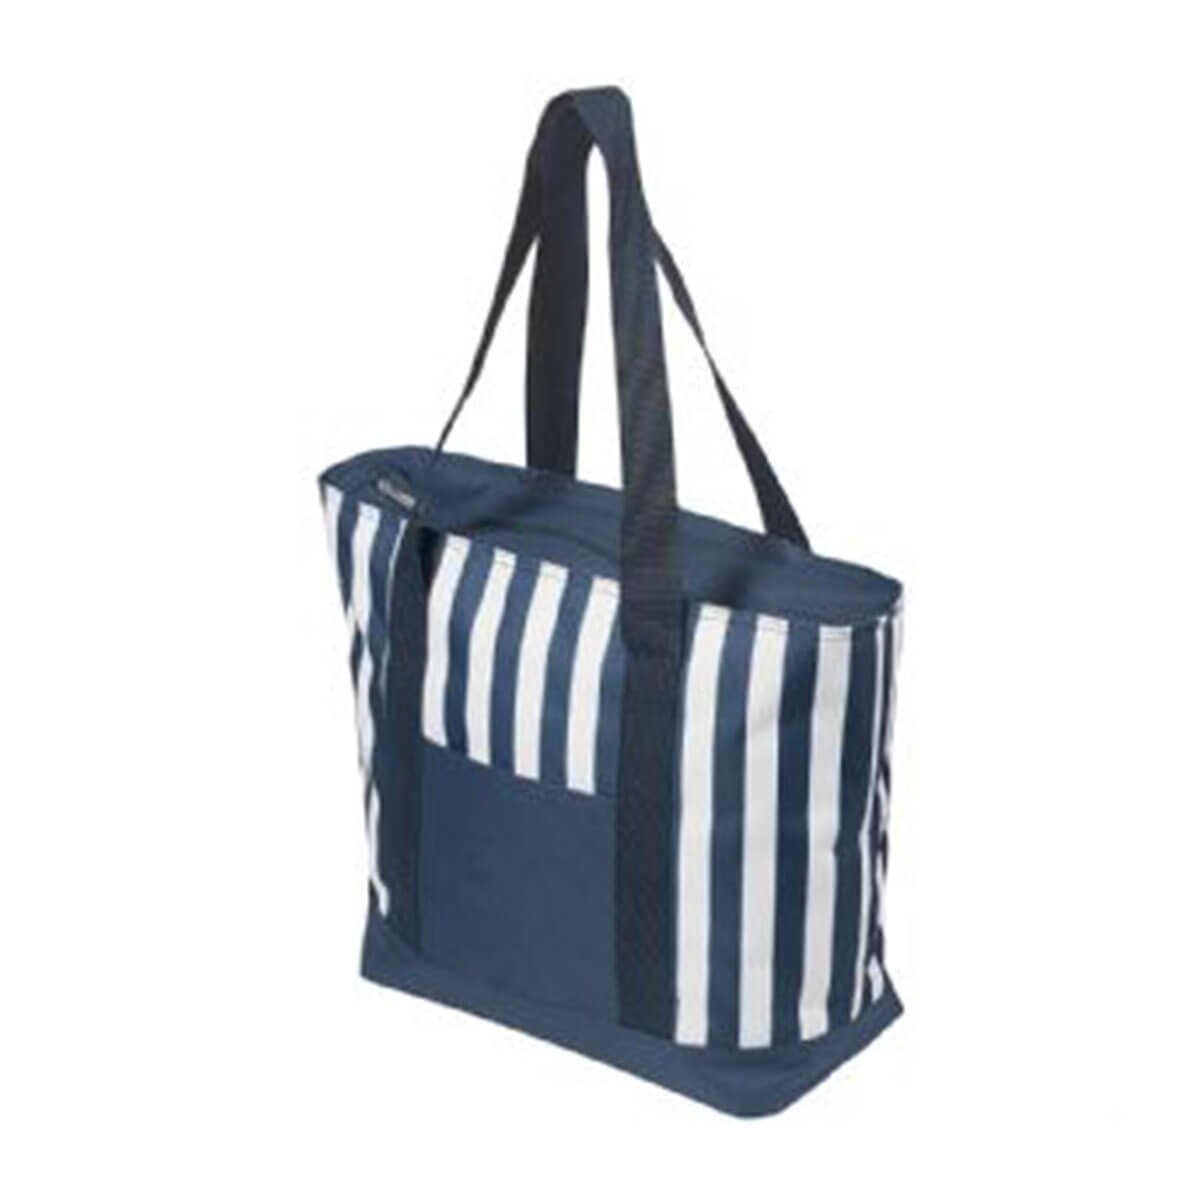 17.5 Litre Zippered Striped Beach Cooler bag-Blue/White